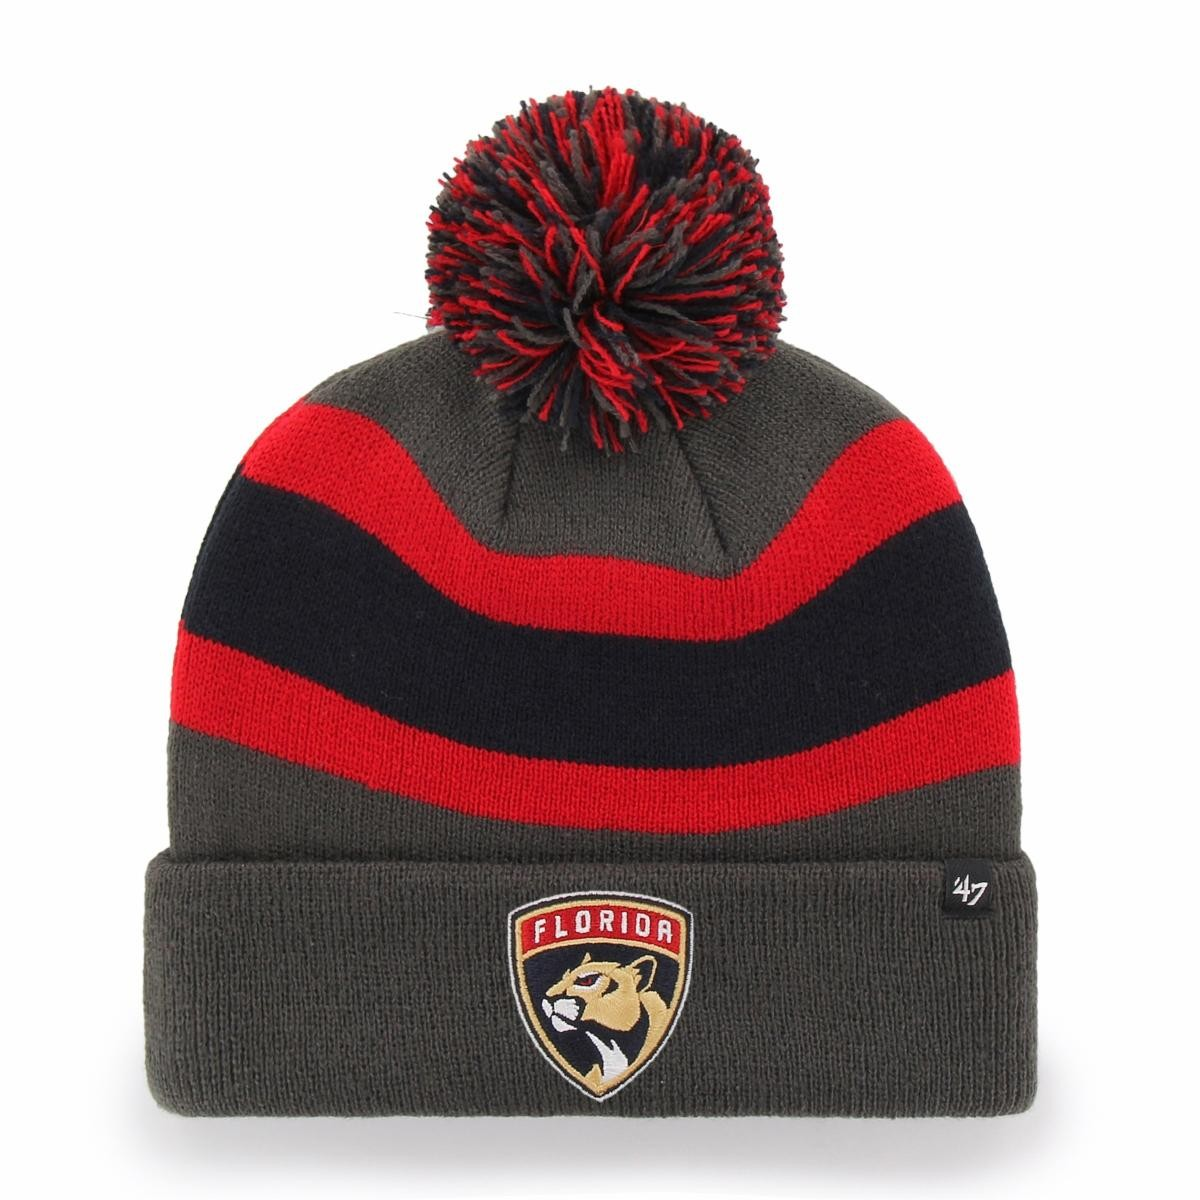 BRAND 47 Florida Panthers Breakaway Cuff Knit Winter Hat